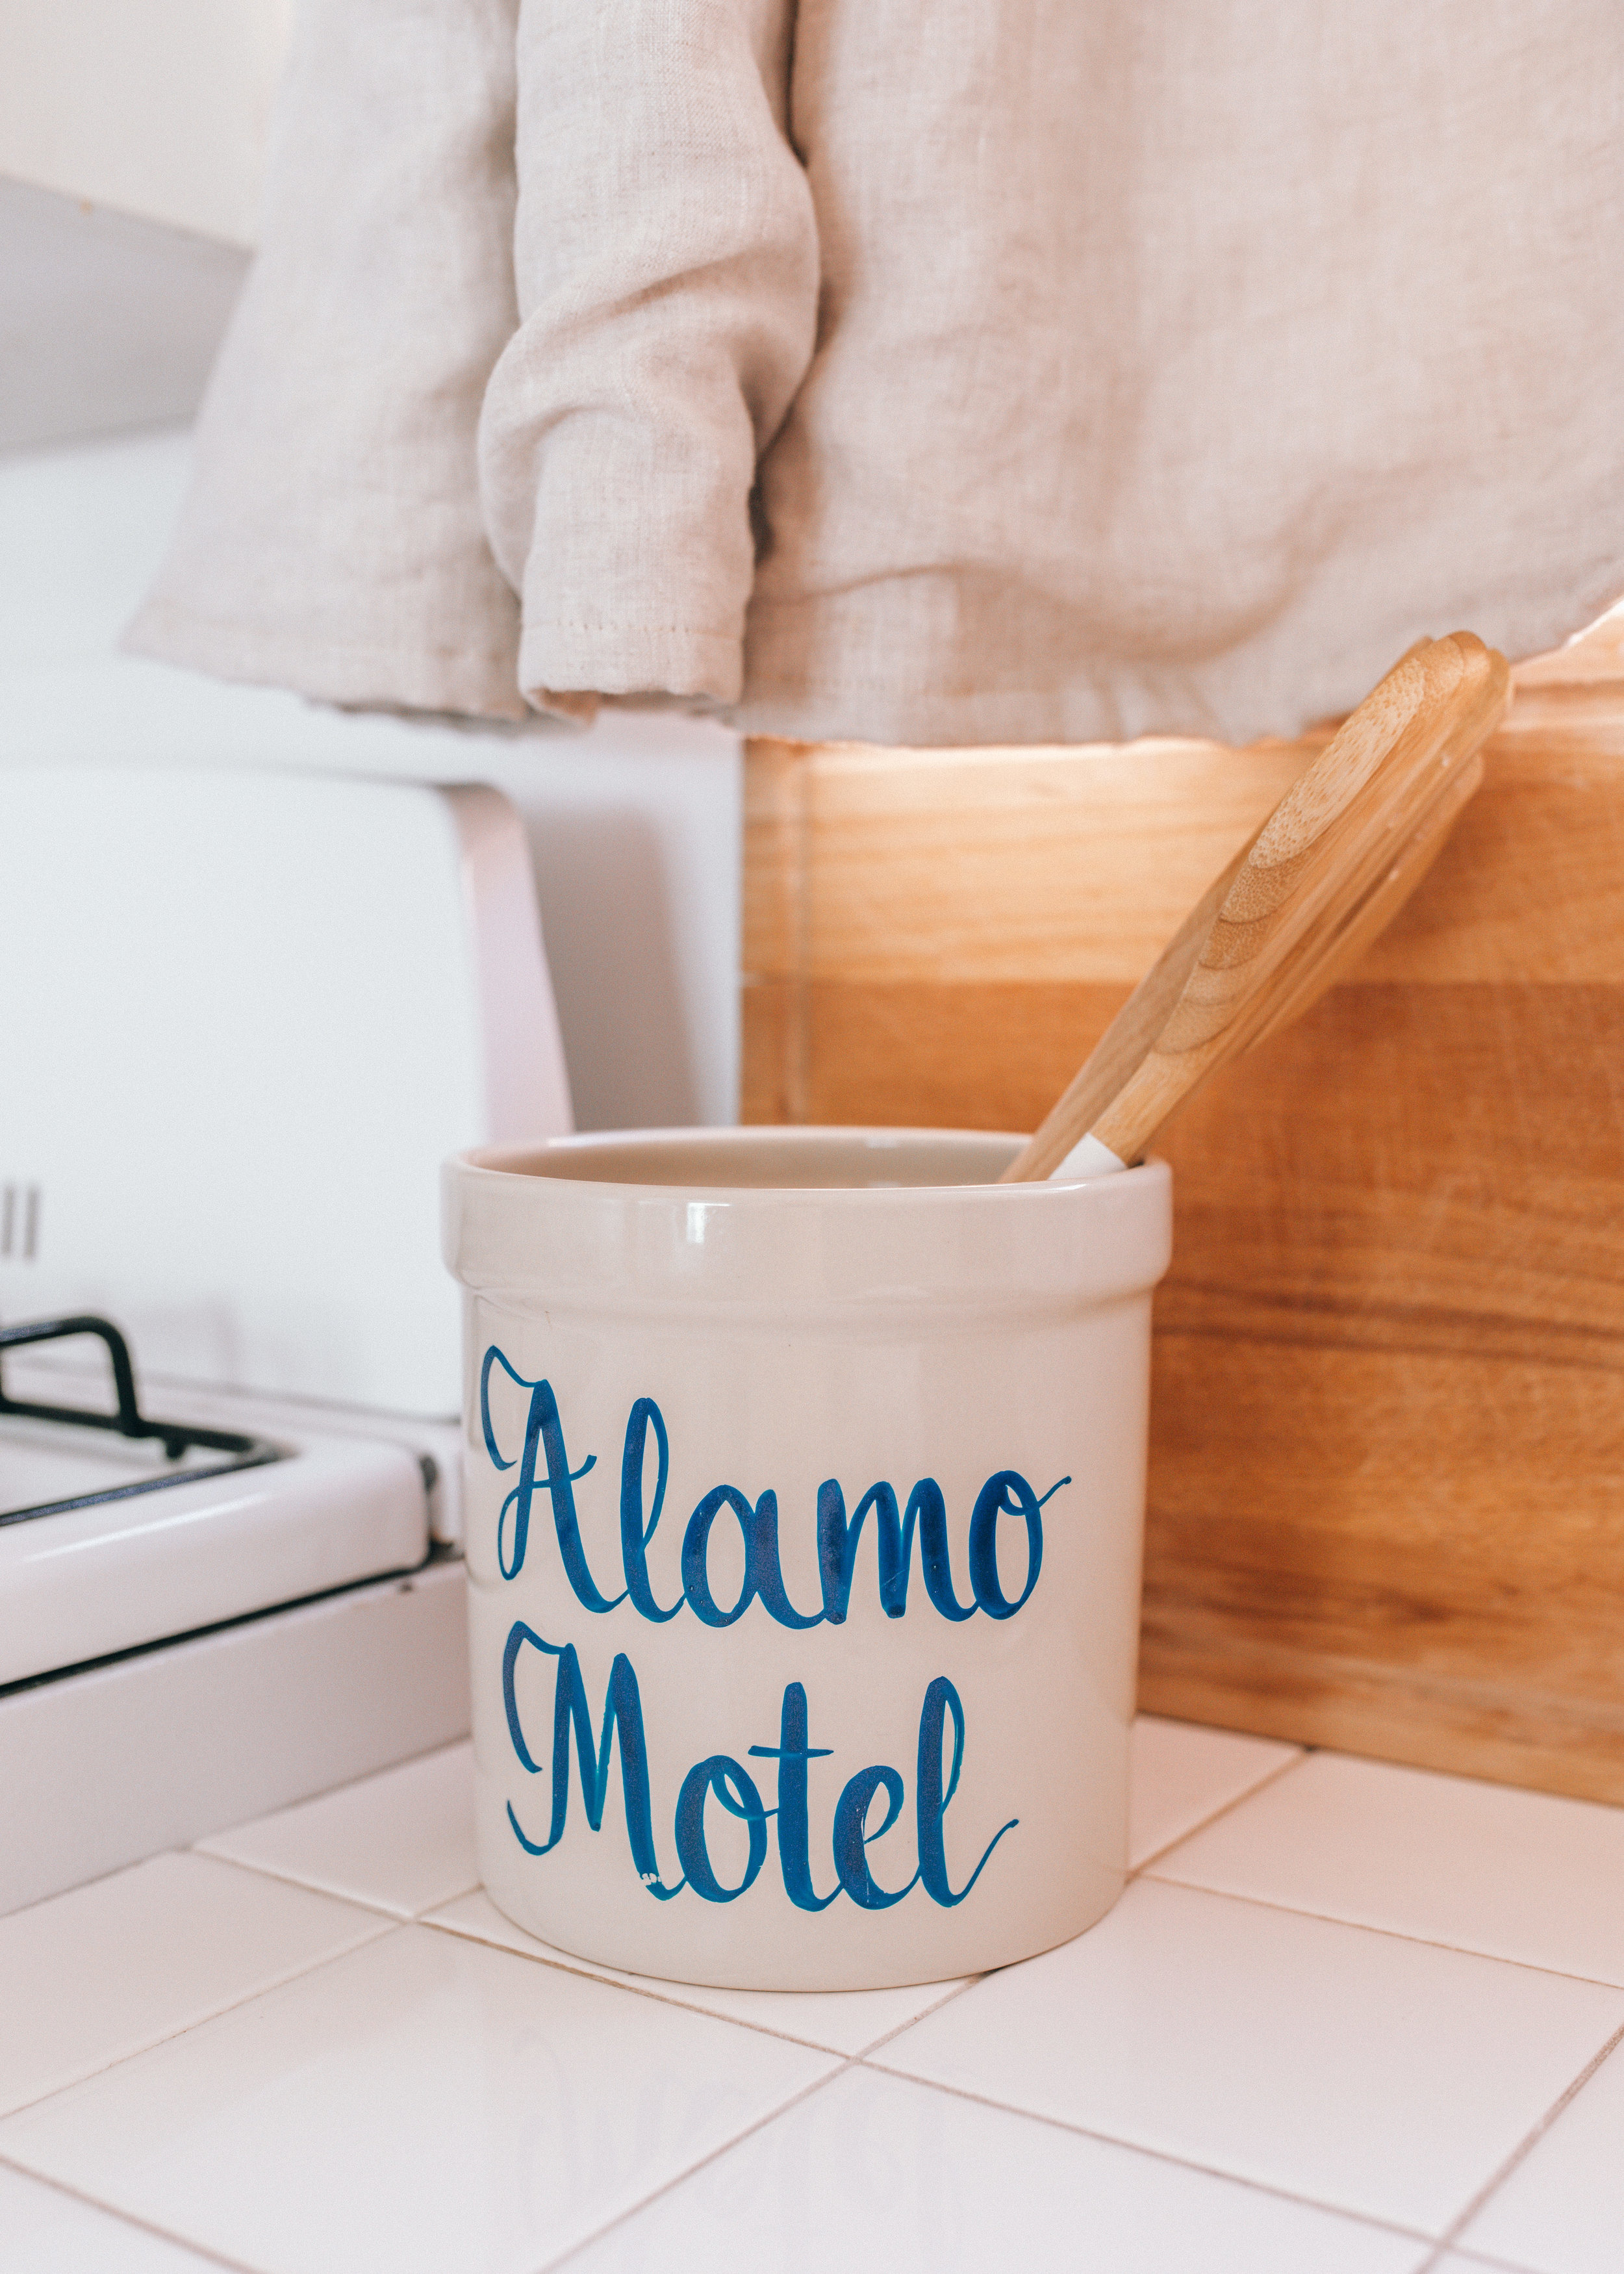 alamo-motel-by-lisa-linh